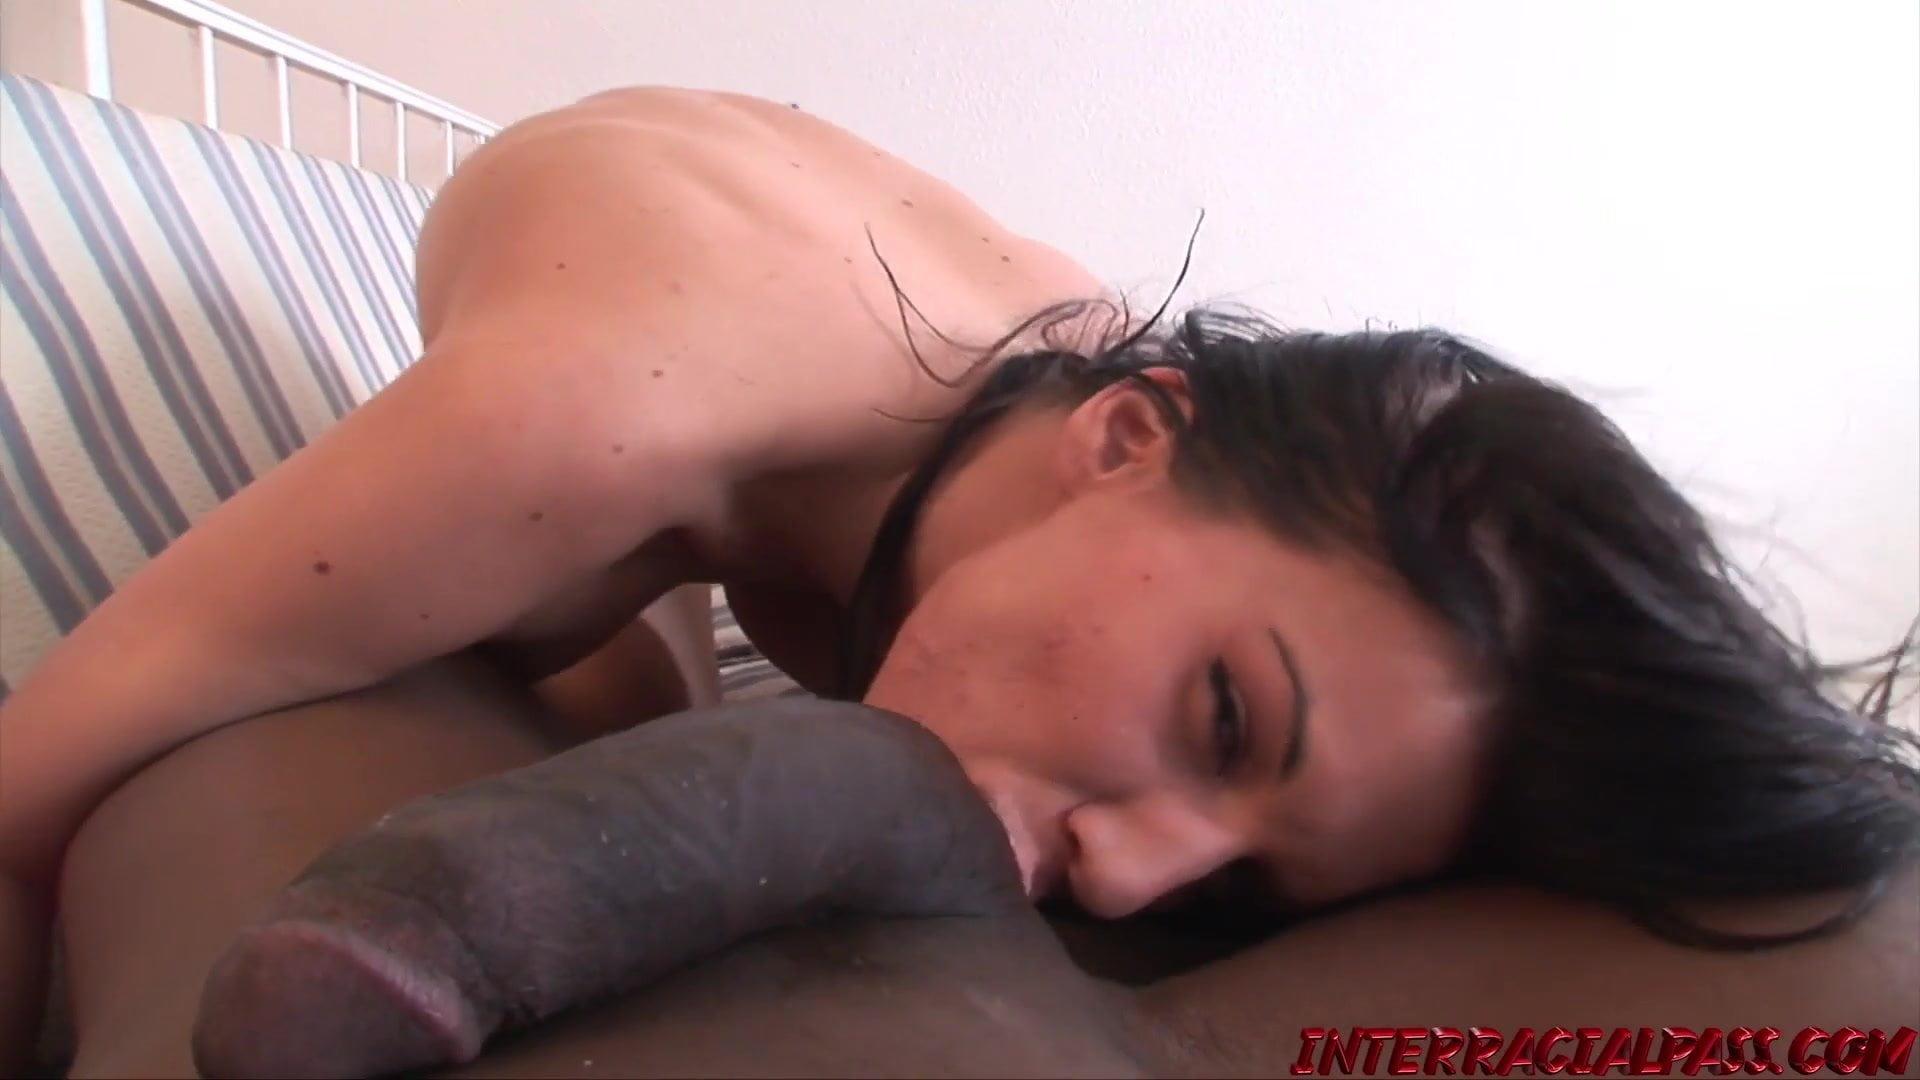 Karina sucks out every last drop of BBC cum